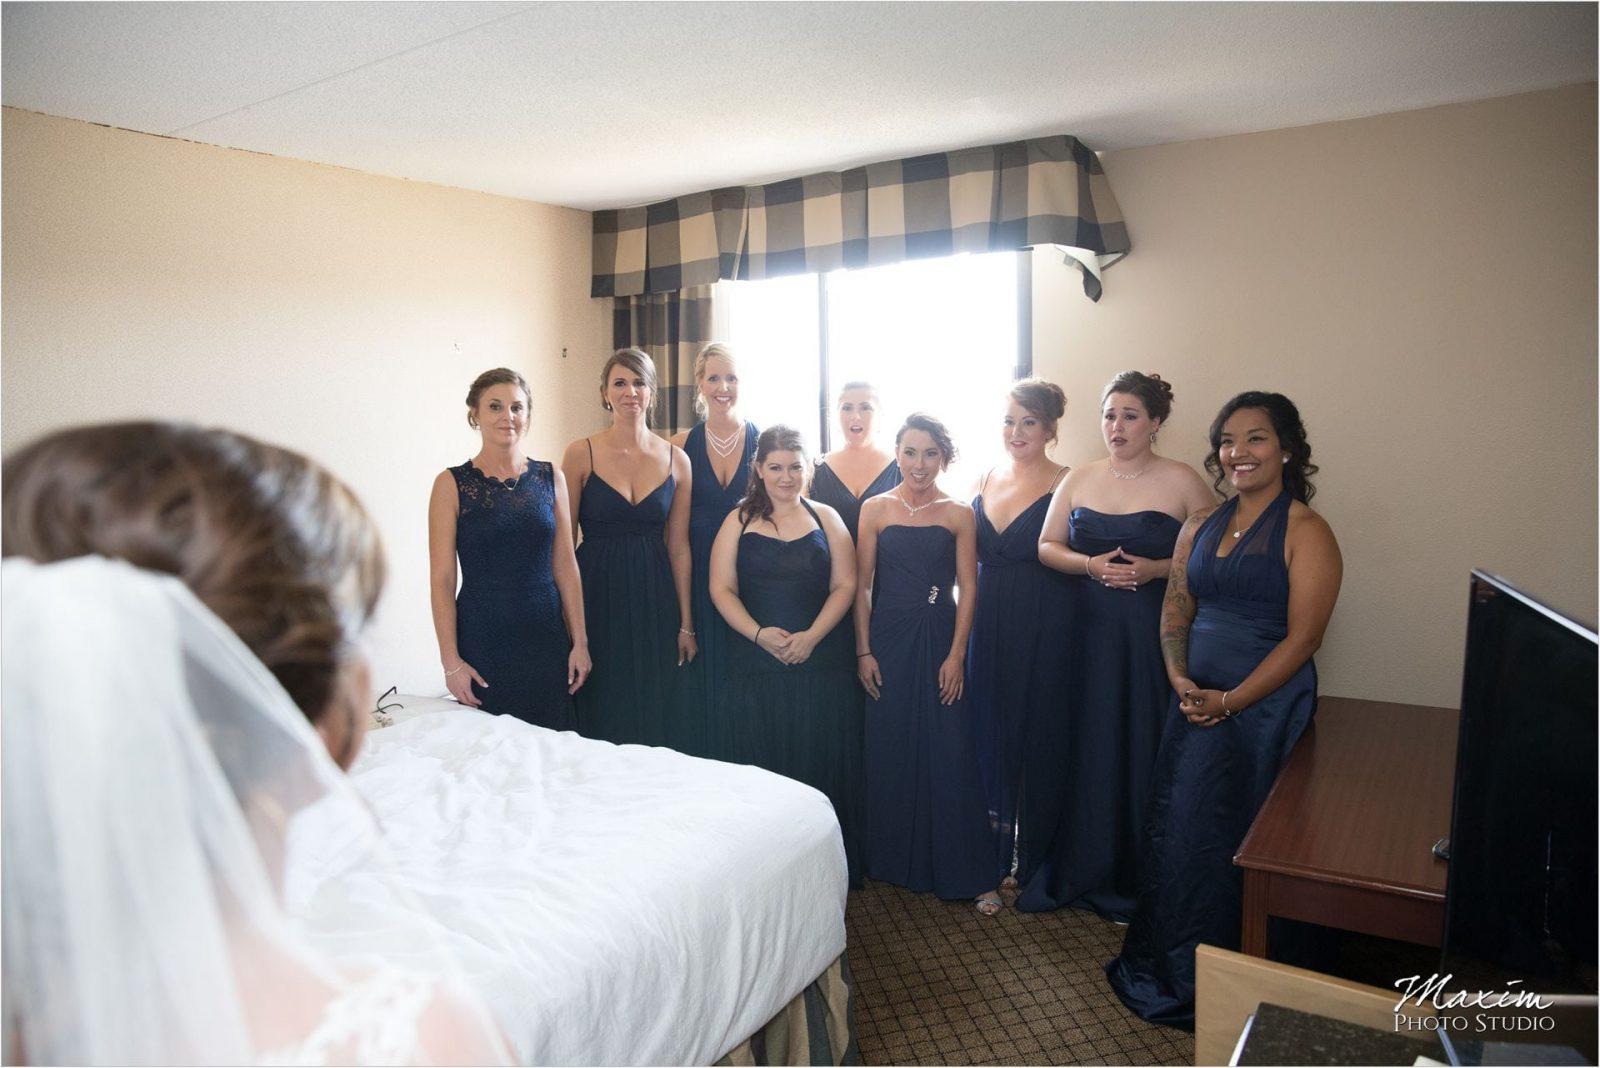 Pattison Park Lodge Wedding bridesmaids reveal